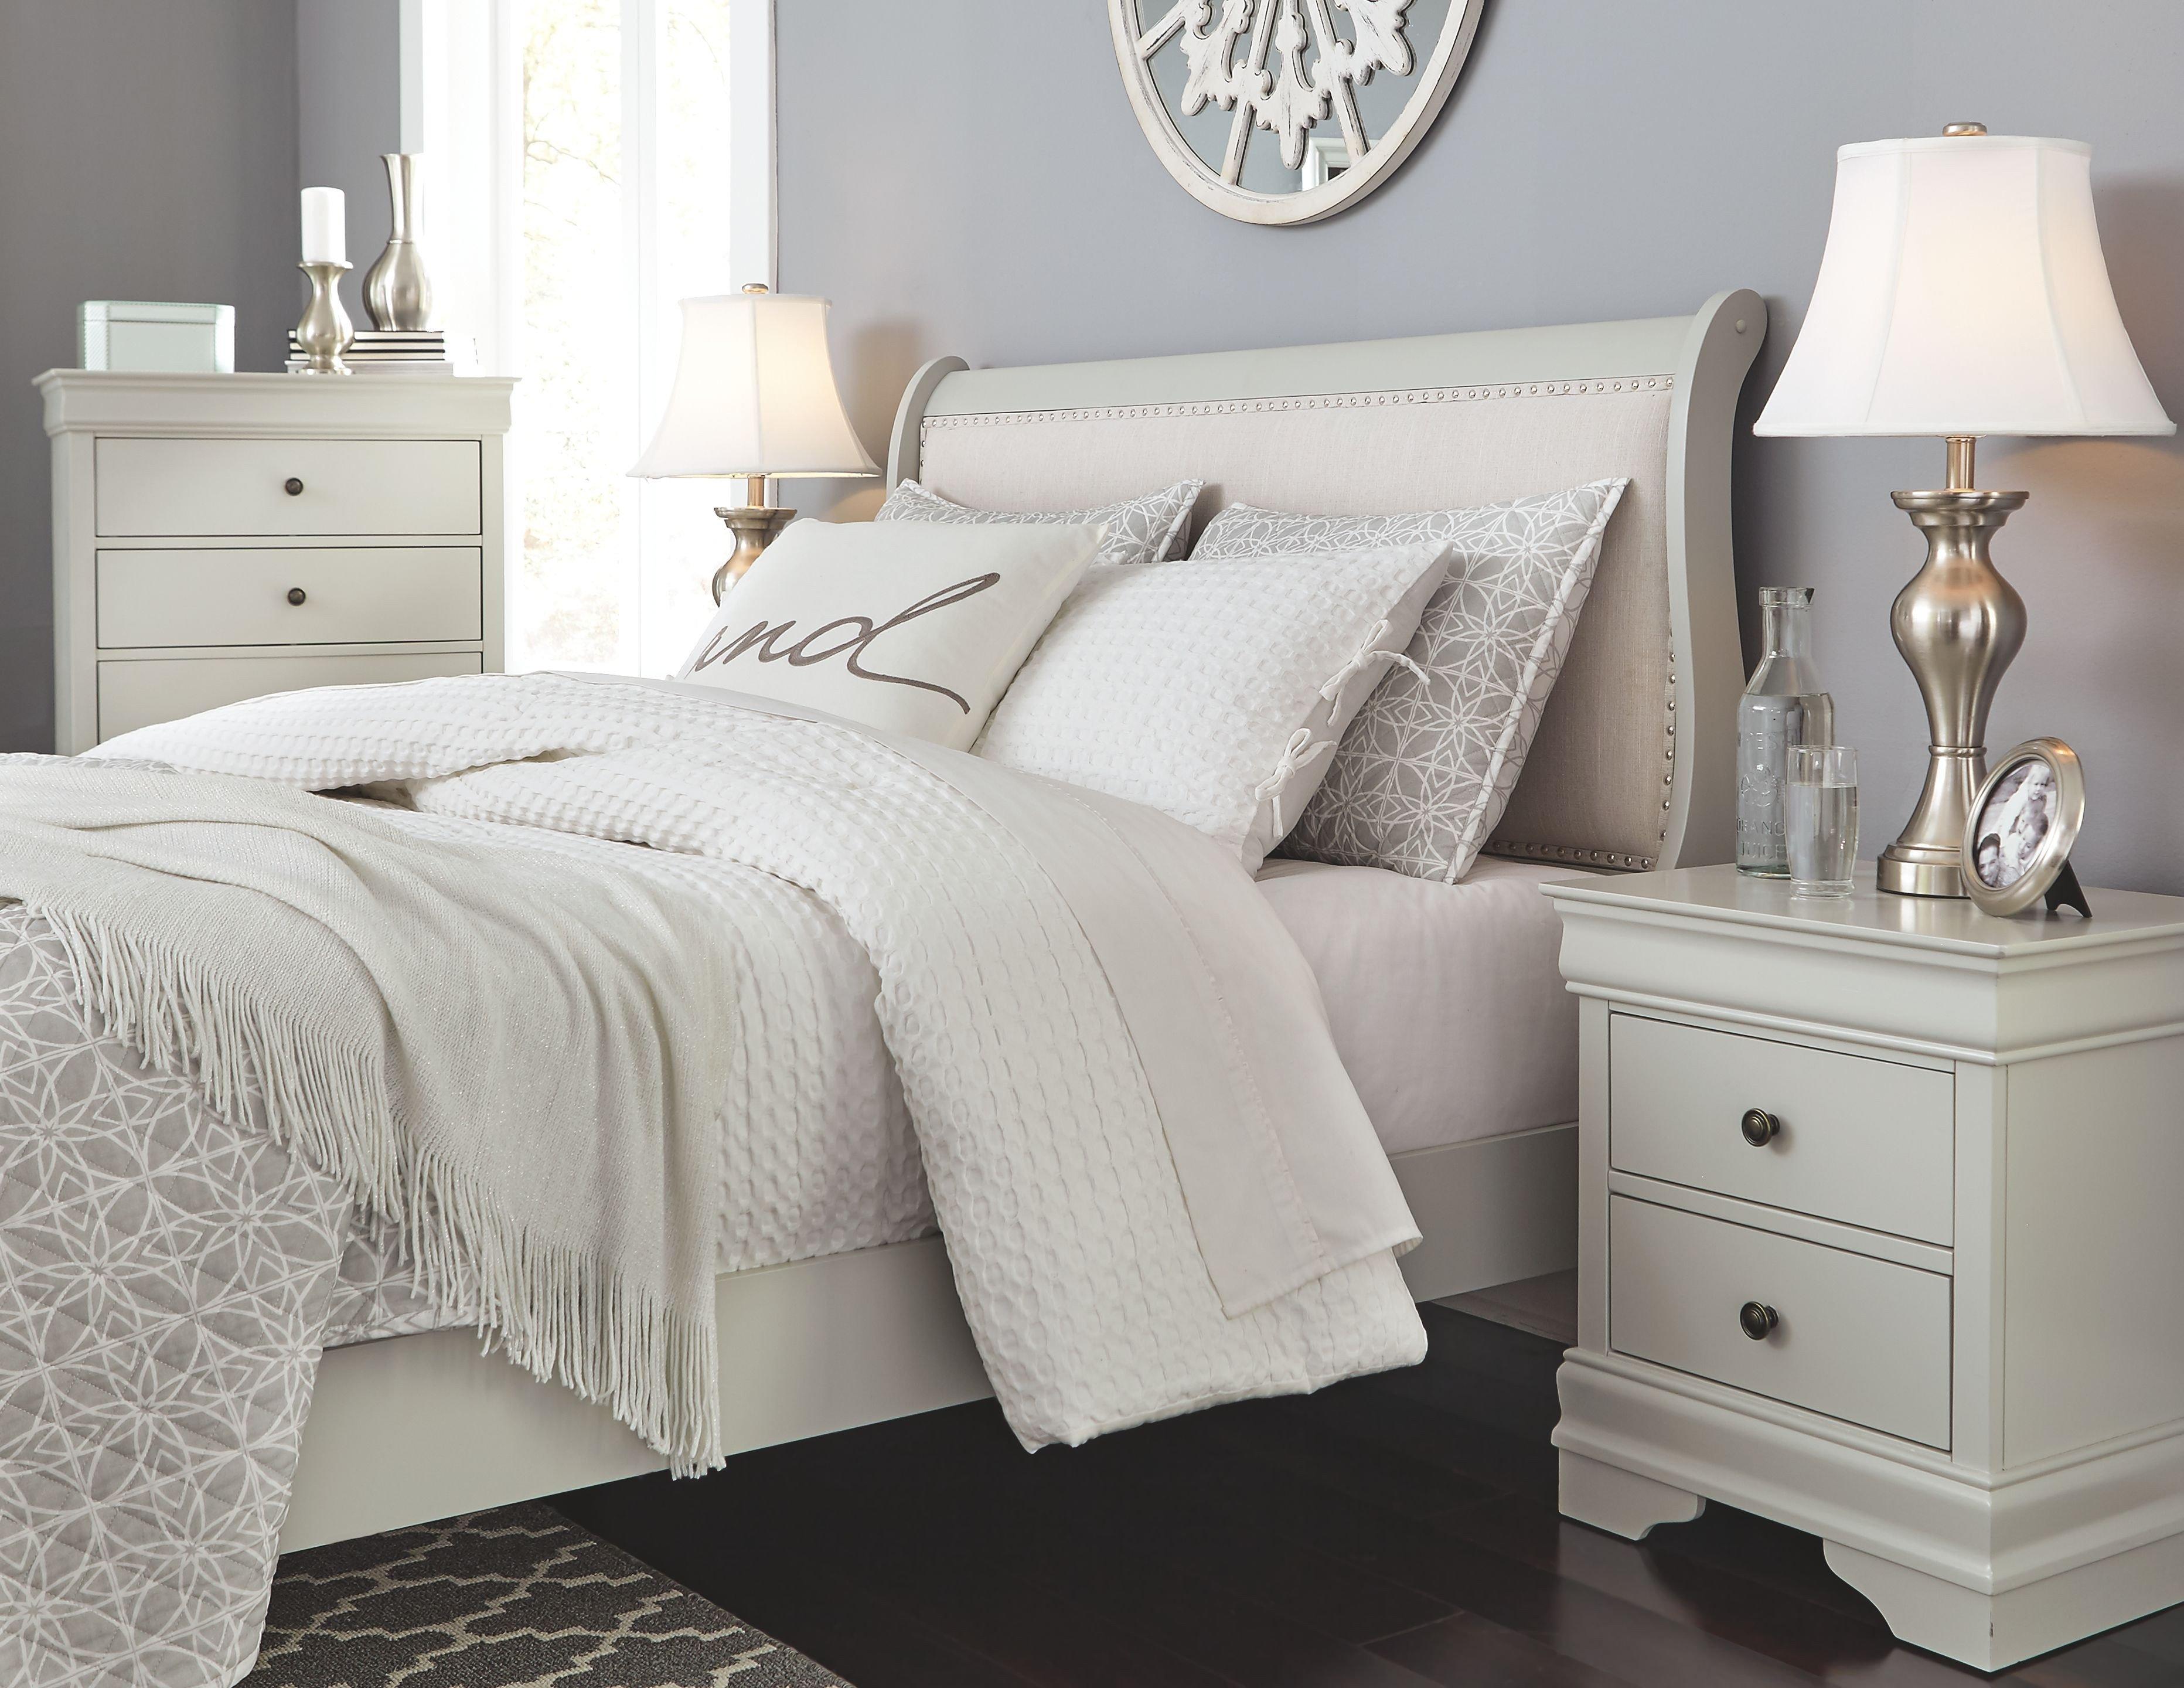 White Master Bedroom Furniture Elegant Jorstad Full Bed with 2 Nightstands Gray